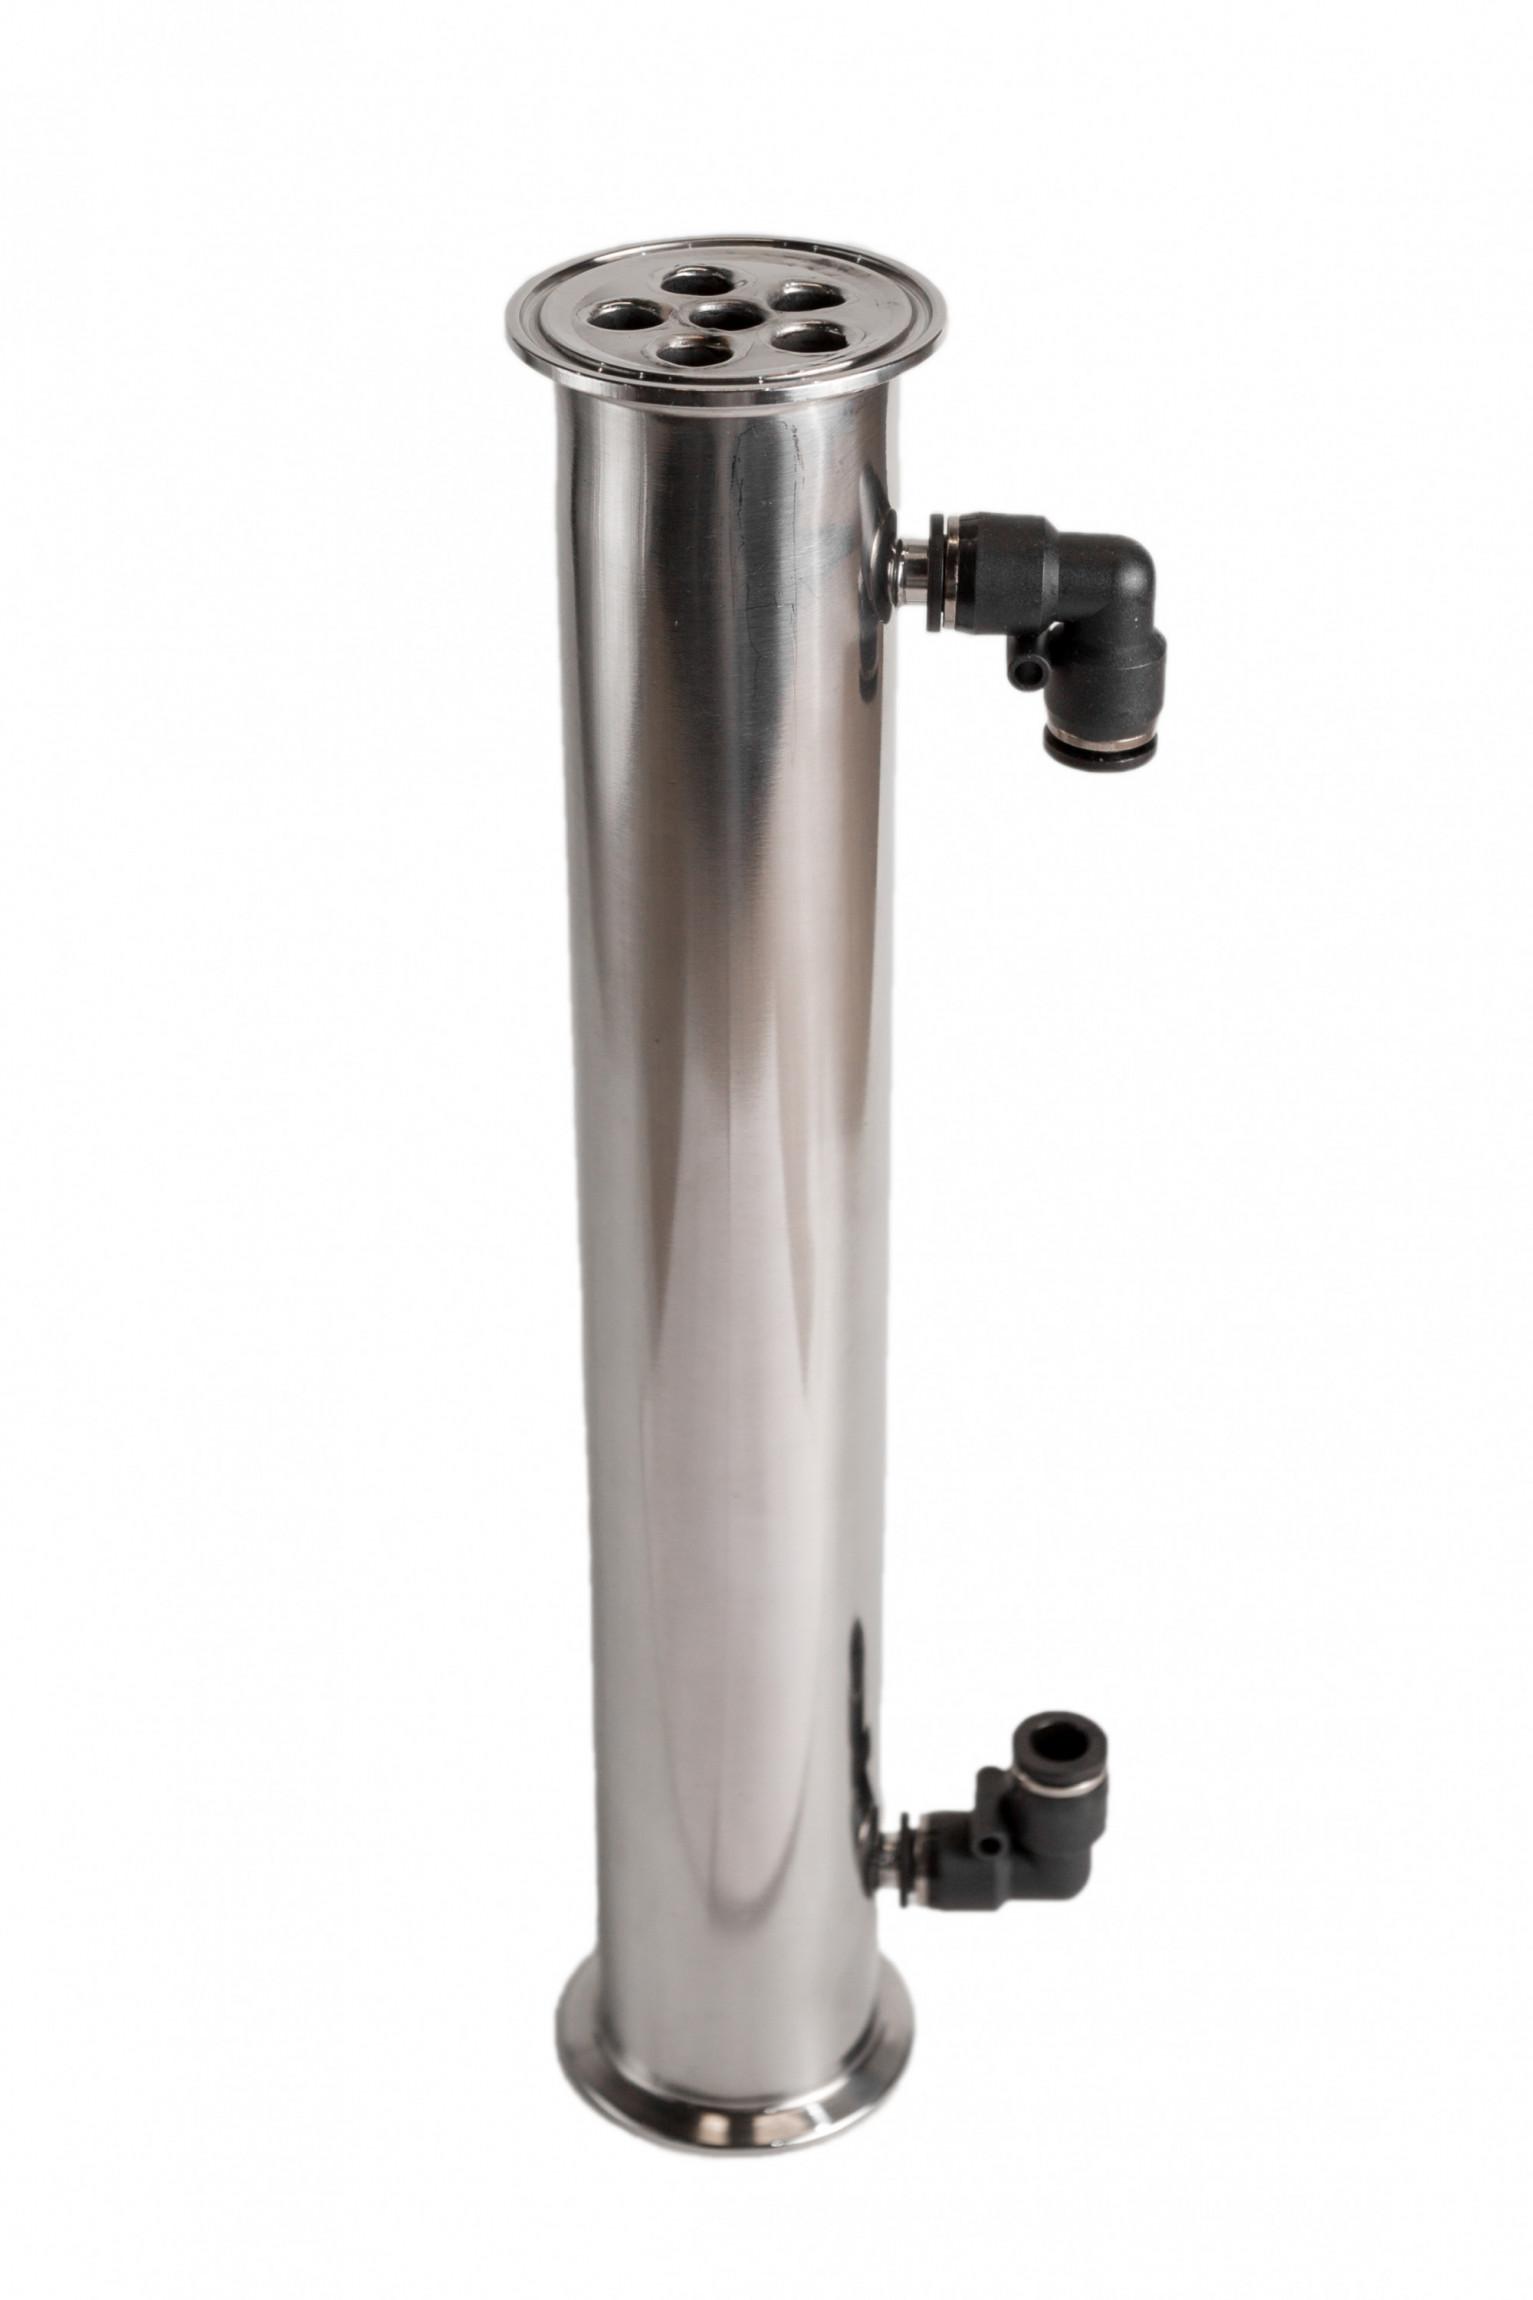 "Холодильник кожухотрубный из нержавейки 330 мм х 2"" (6 трубок)"